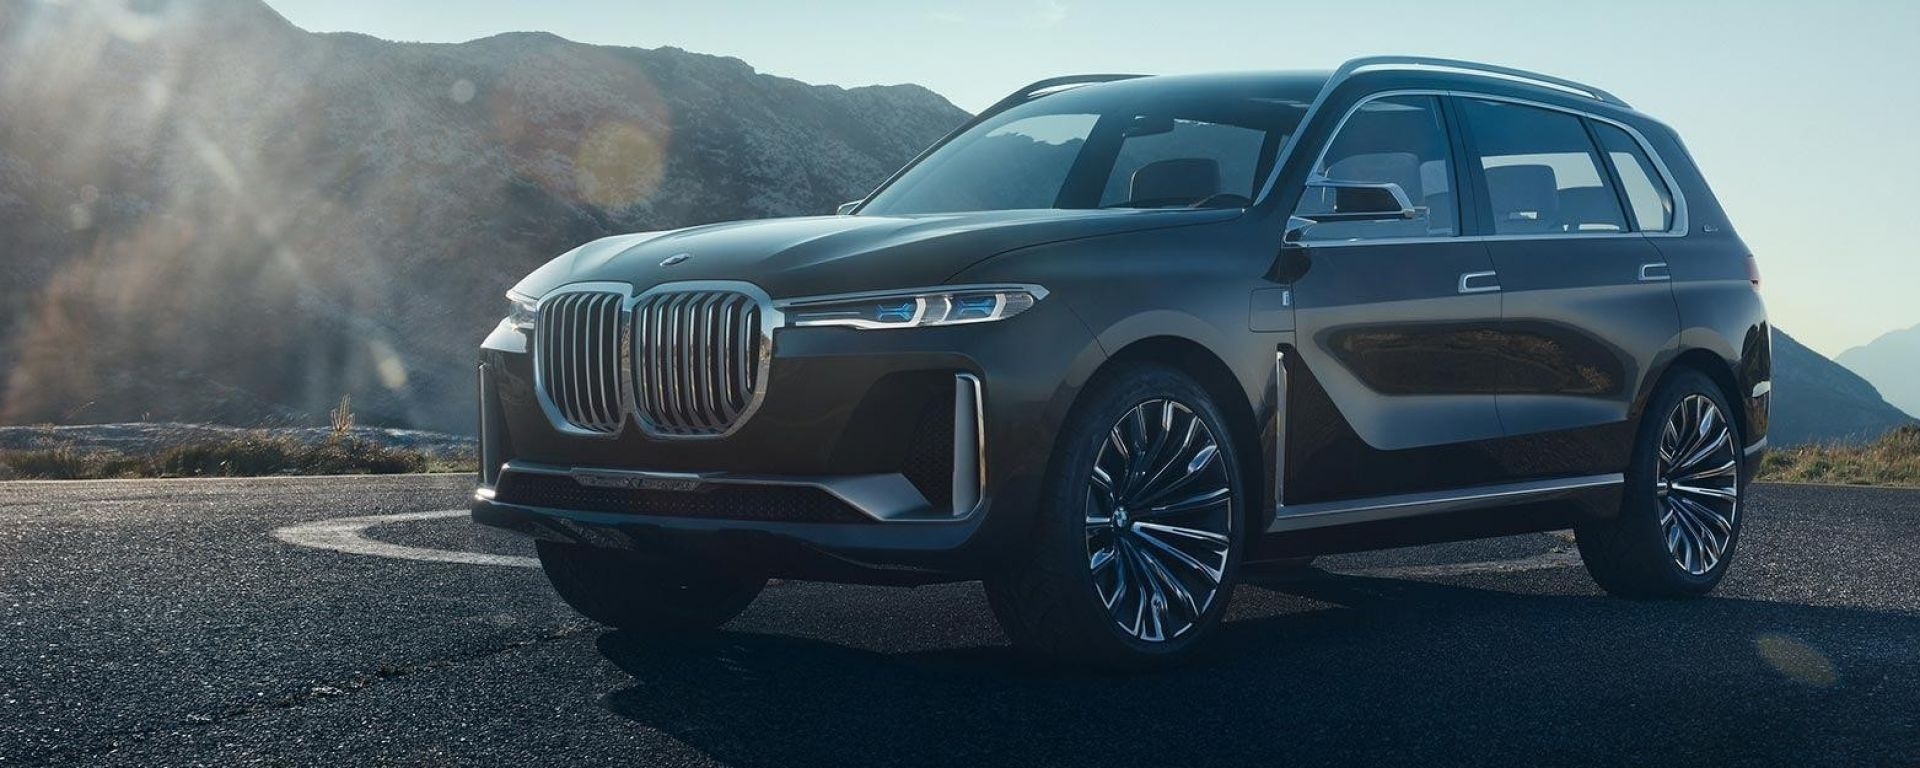 BMW X7 Concept: le foto in anteprima